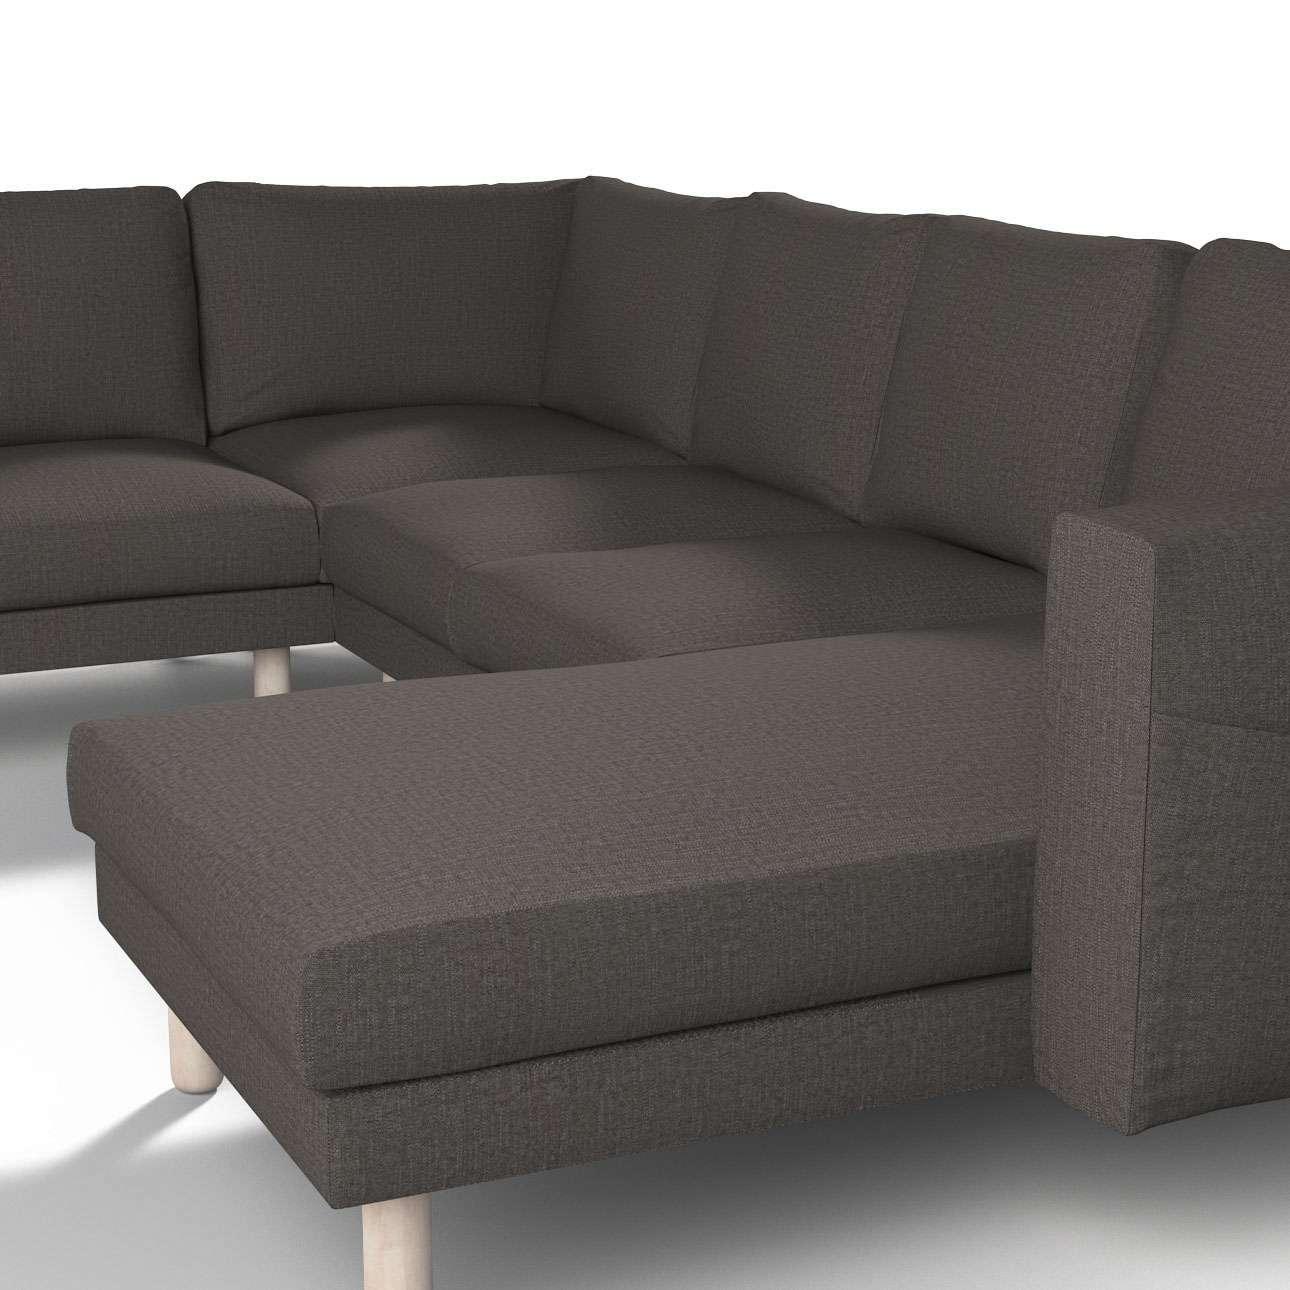 norsborg bezug f r 5 sitzer ecksofa mit recamiere braun. Black Bedroom Furniture Sets. Home Design Ideas